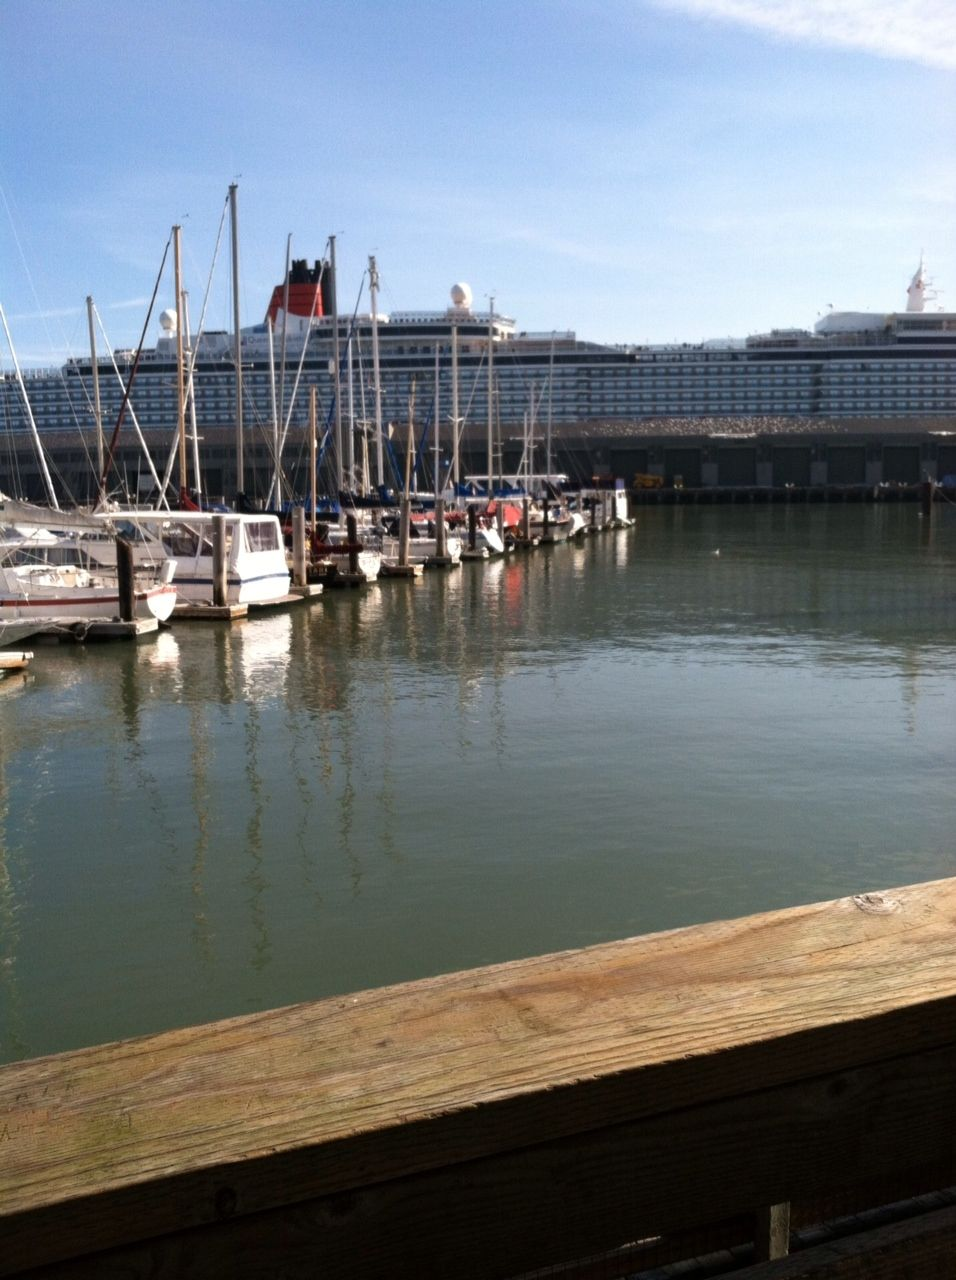 Queen Elizabeth in San Francisco from Pier